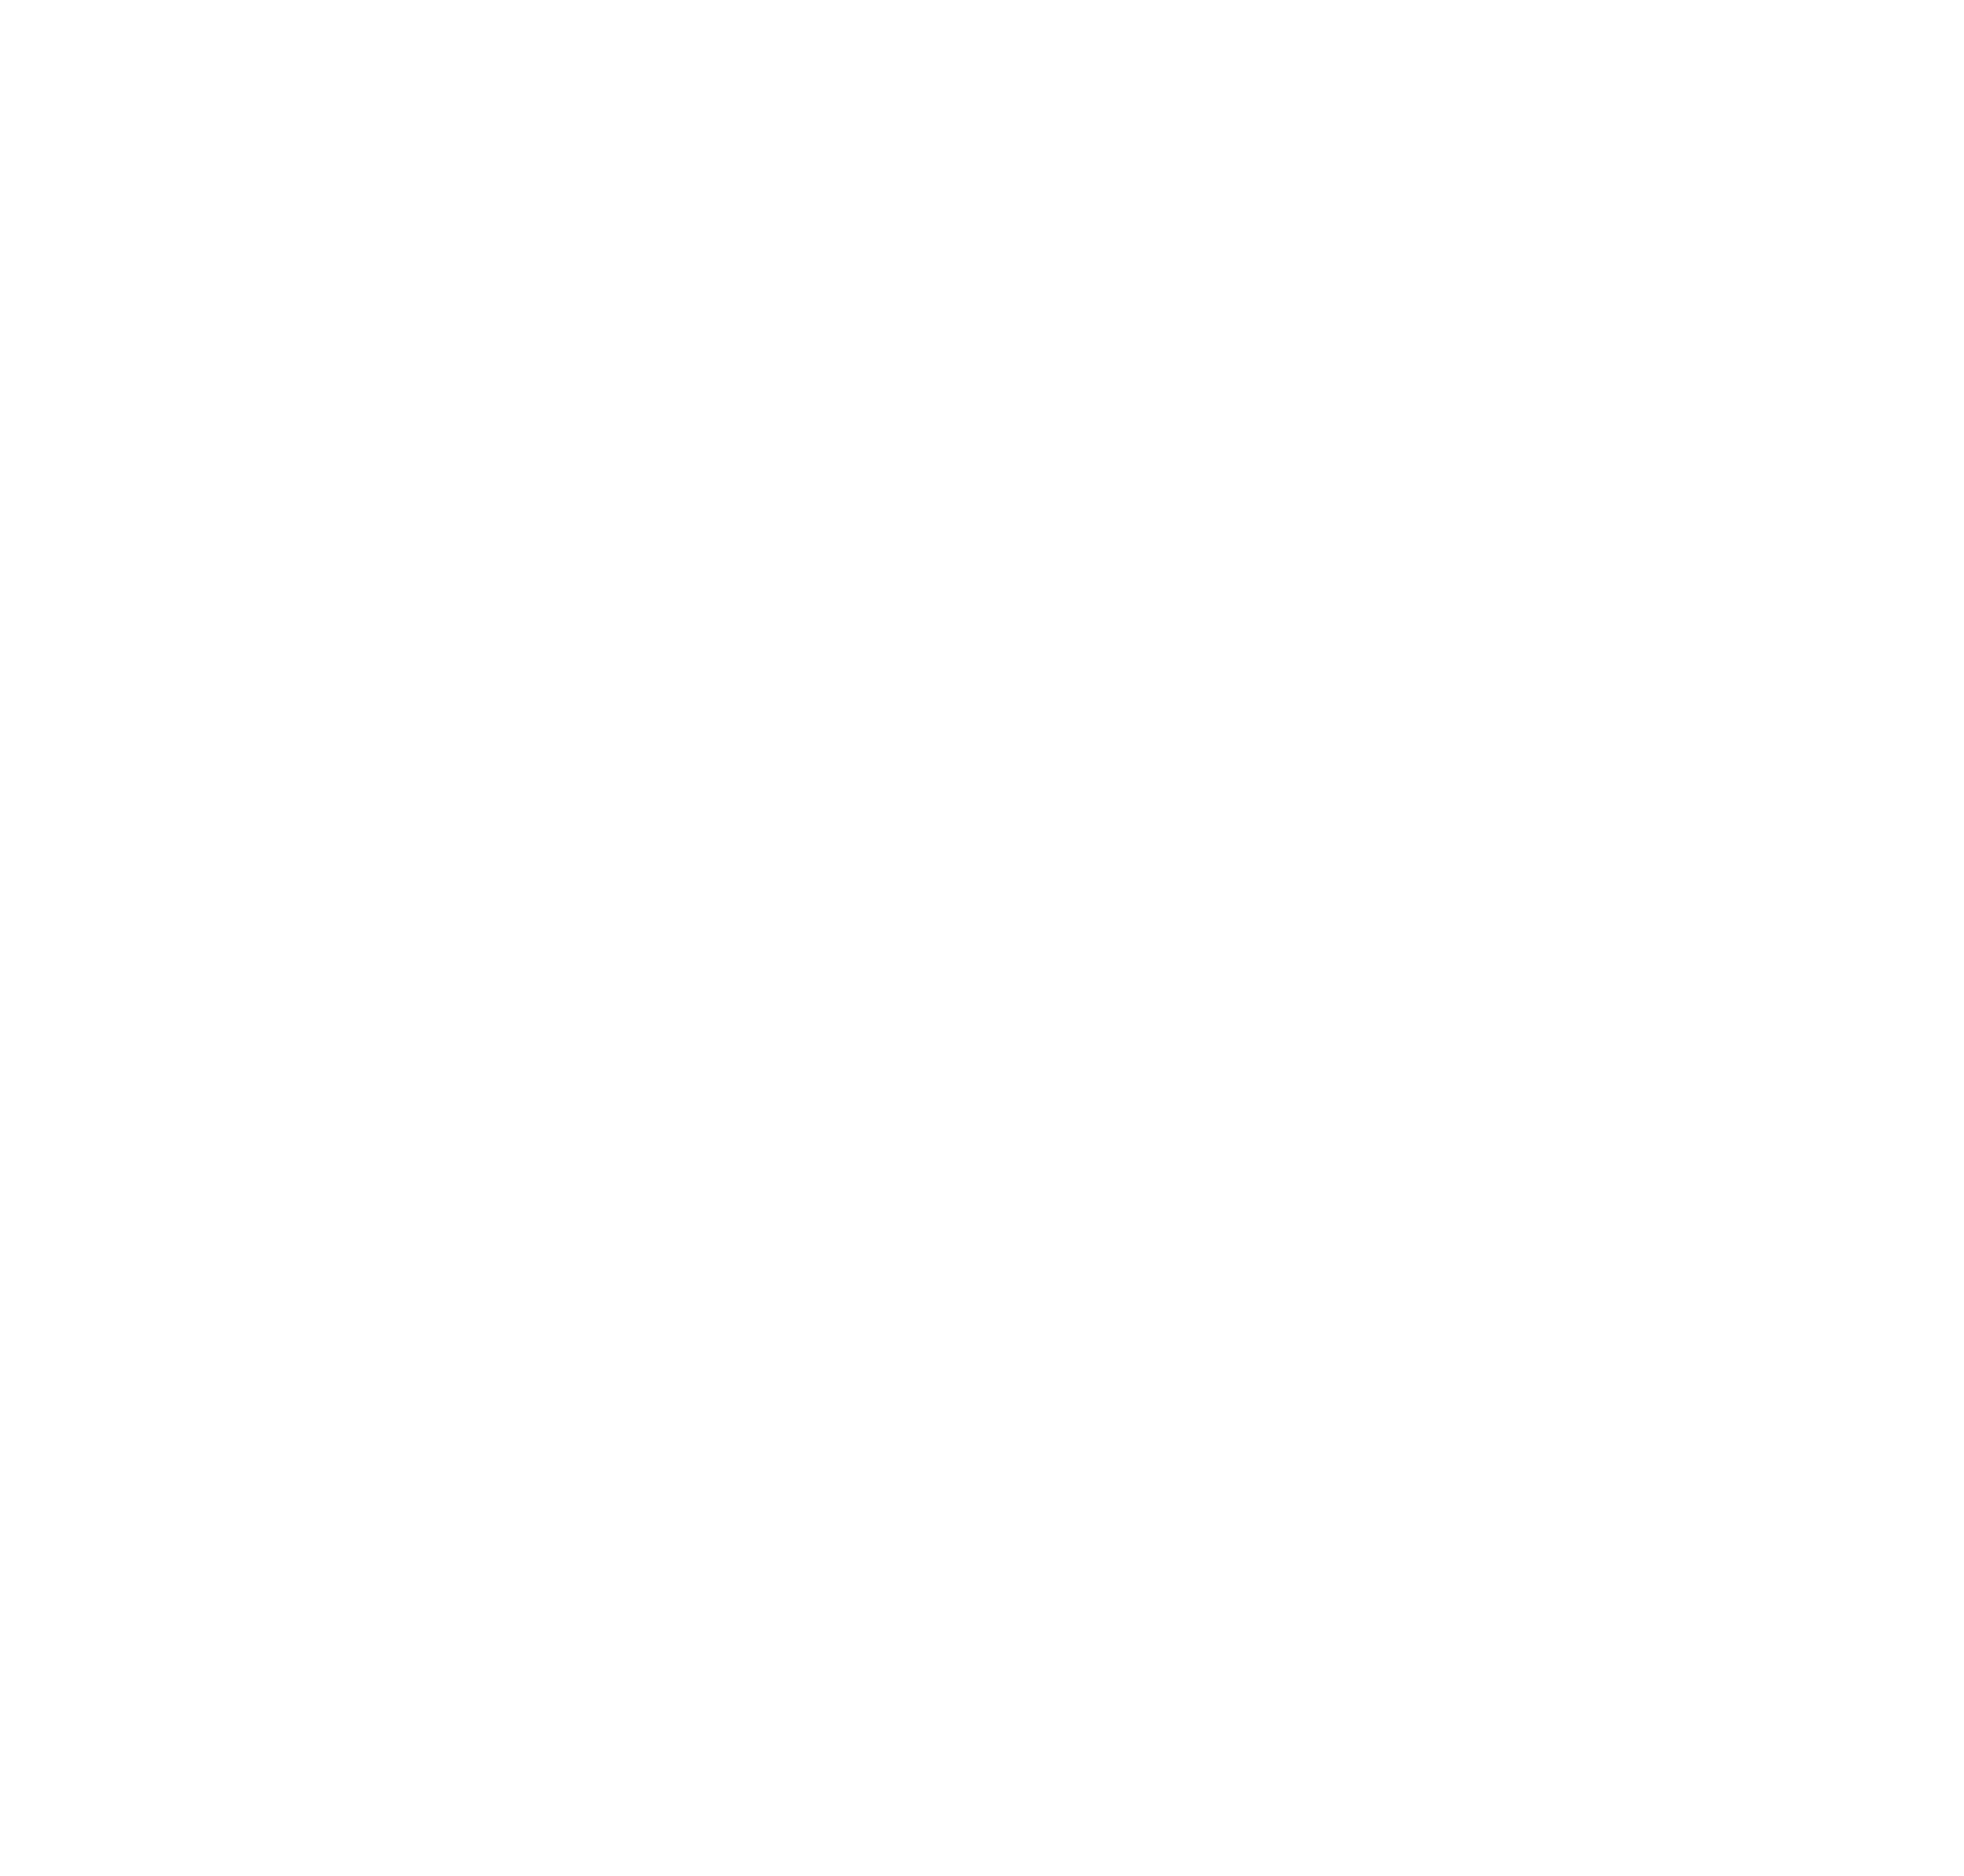 ilguciema-ilgezeem